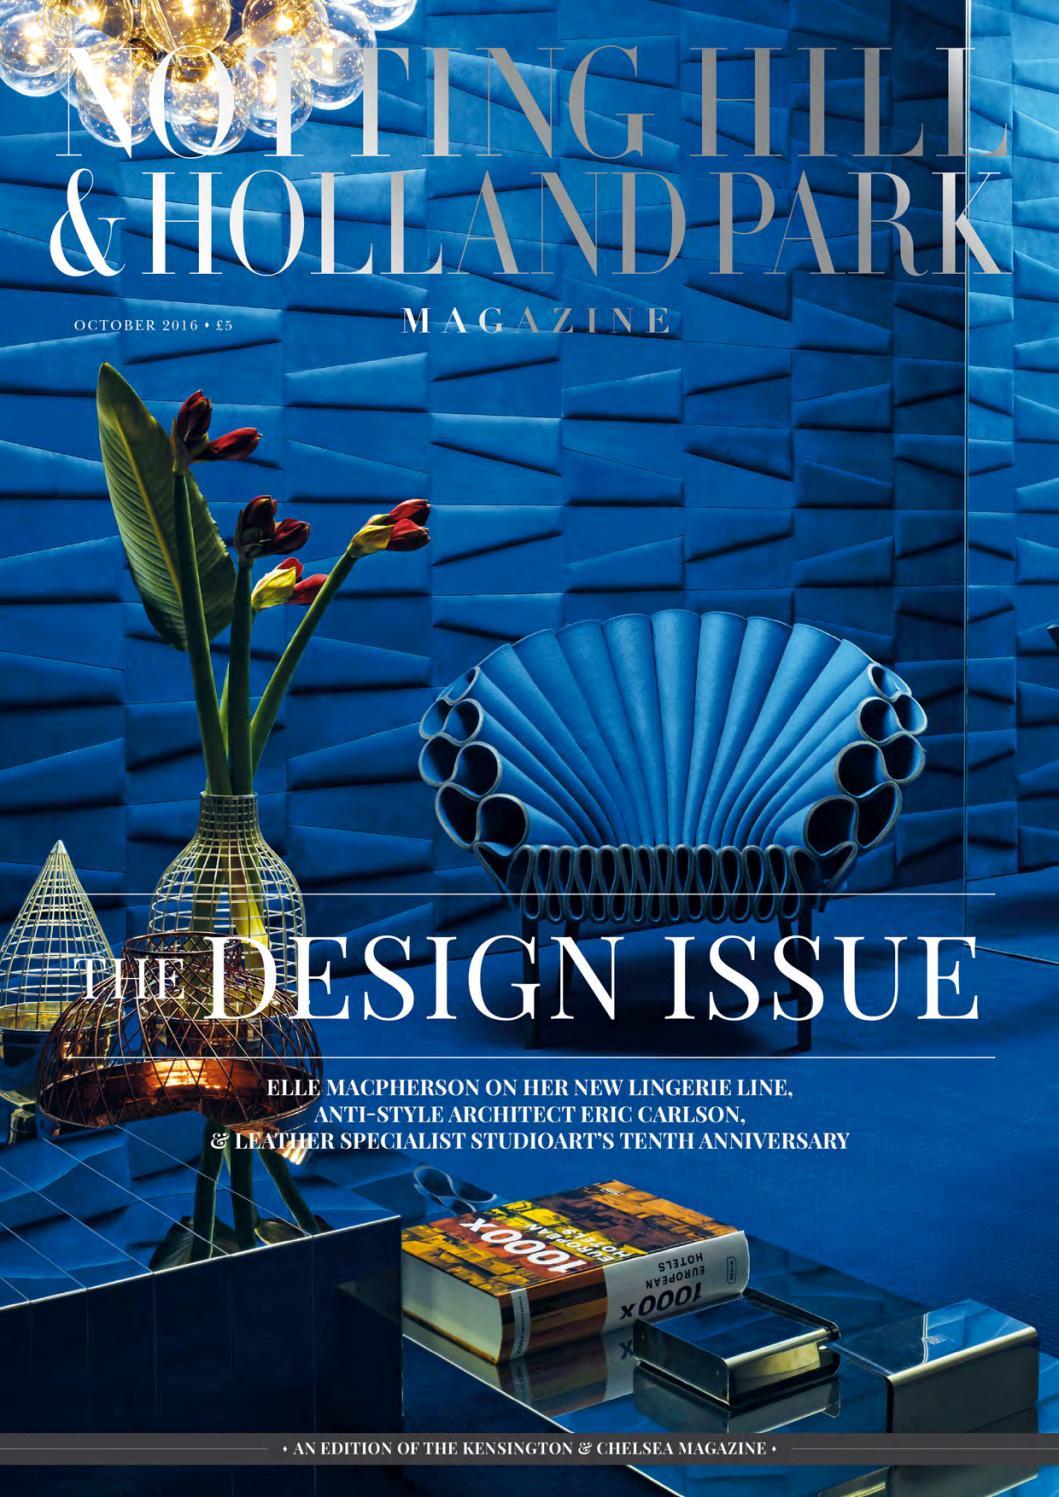 Online immediate appraisal vintage magazine or